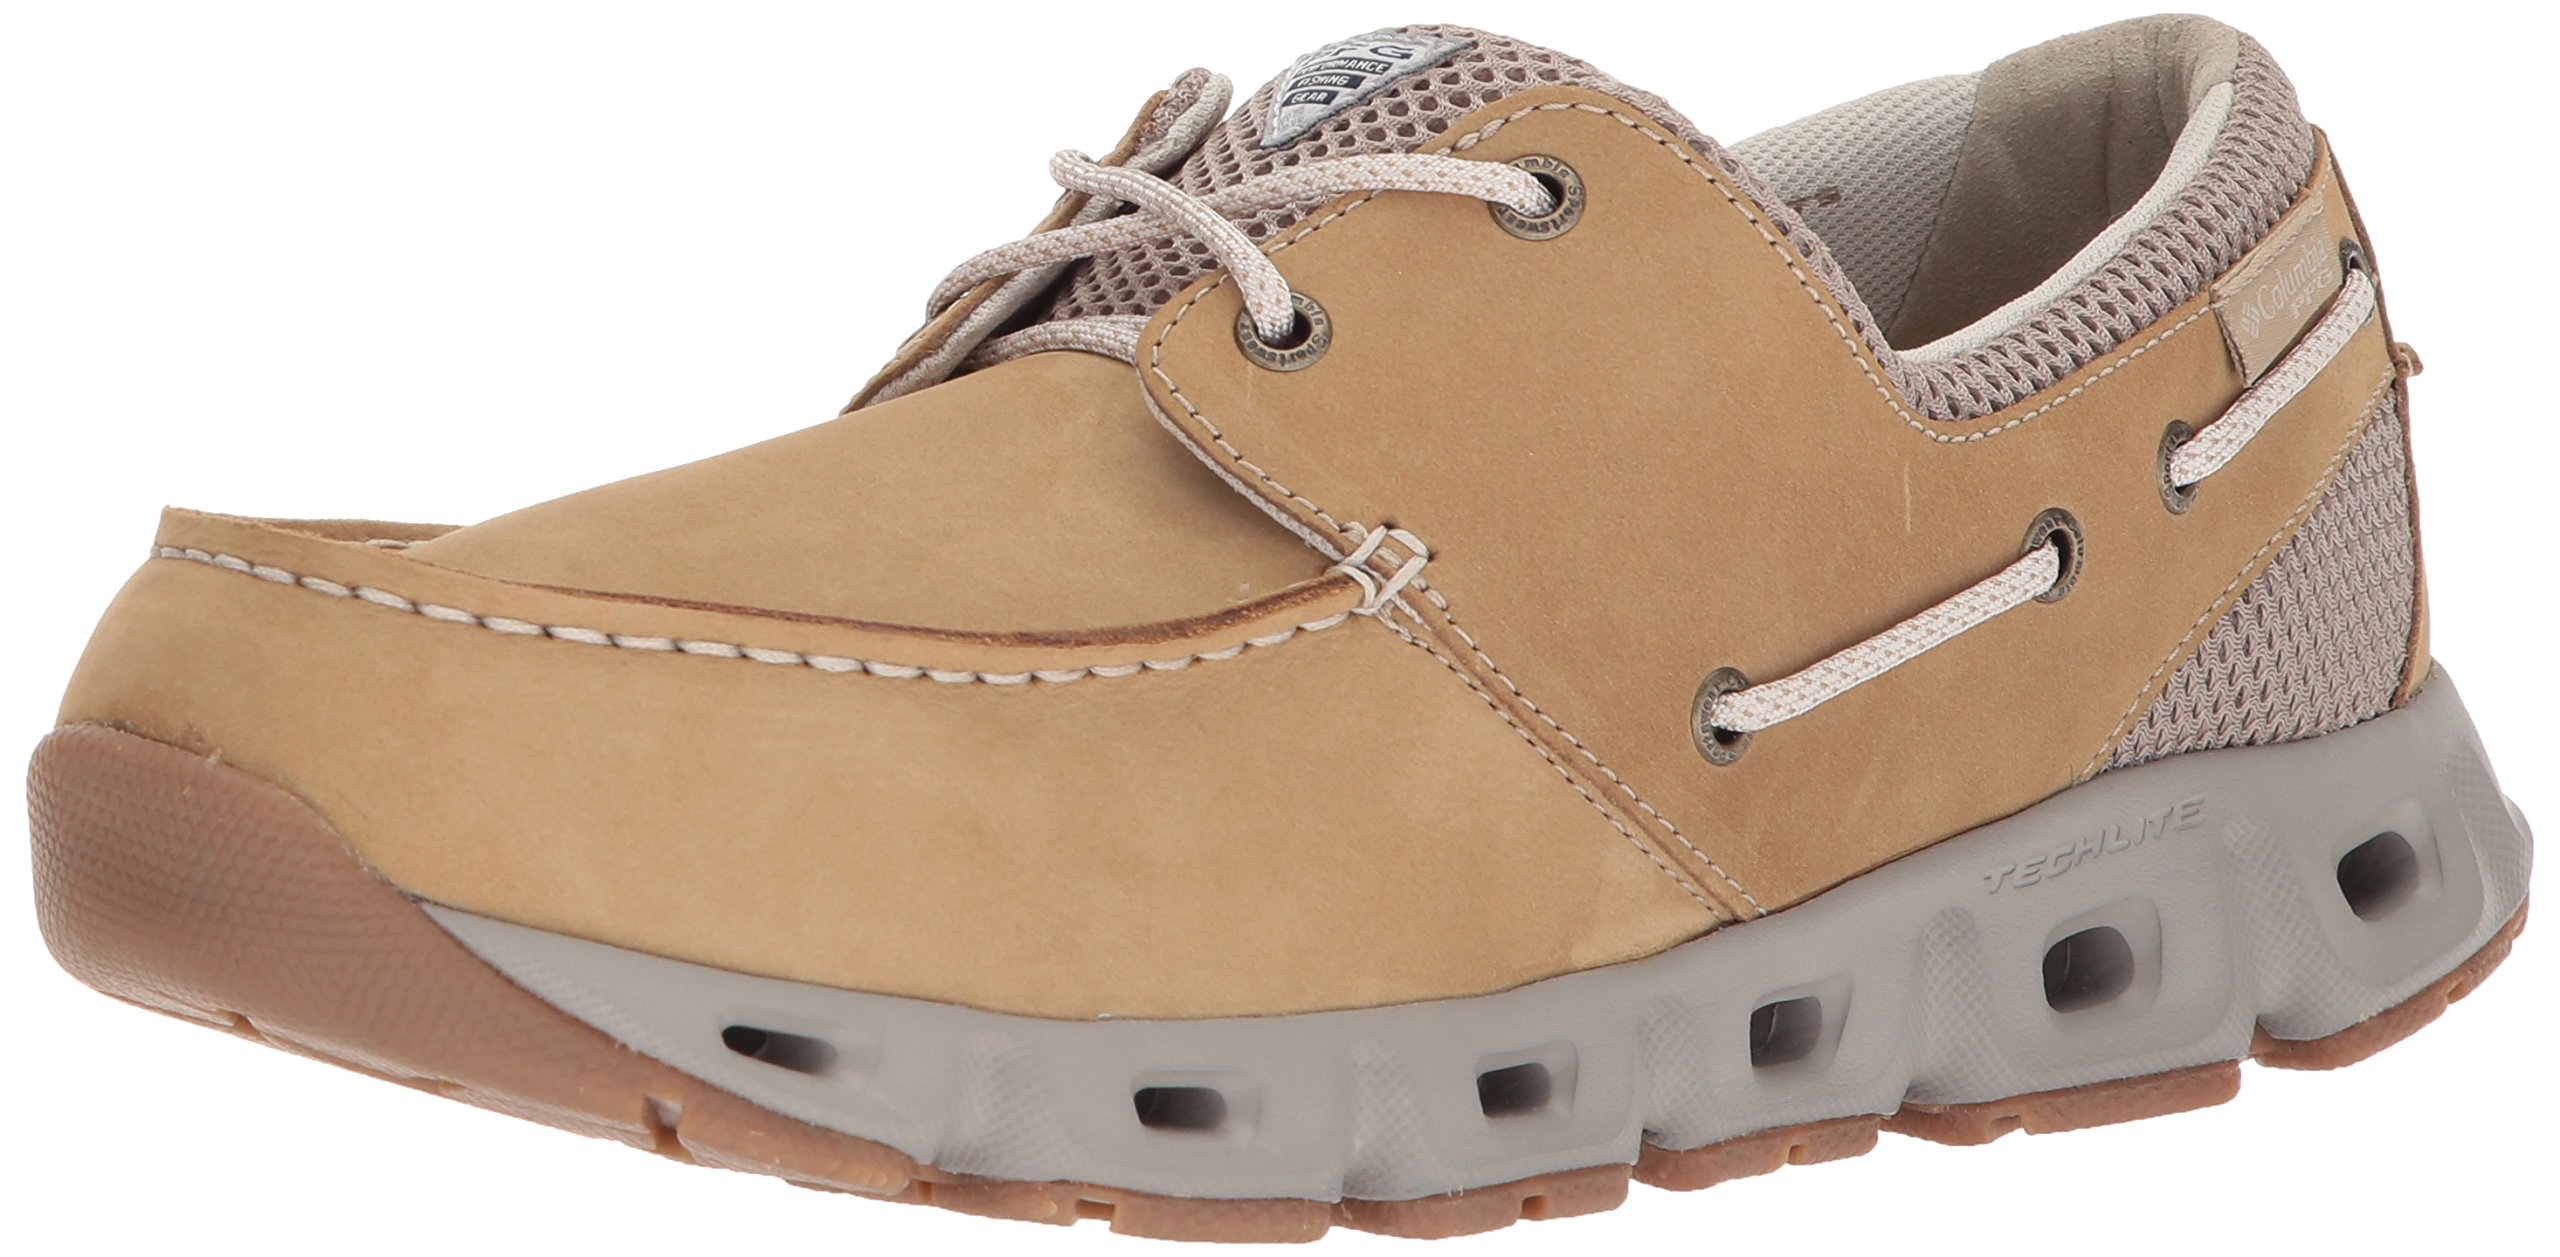 Columbia PFG Men's BOATDRAINER III PFG Boat Shoe, British tan, Fawn, 9 Regular US